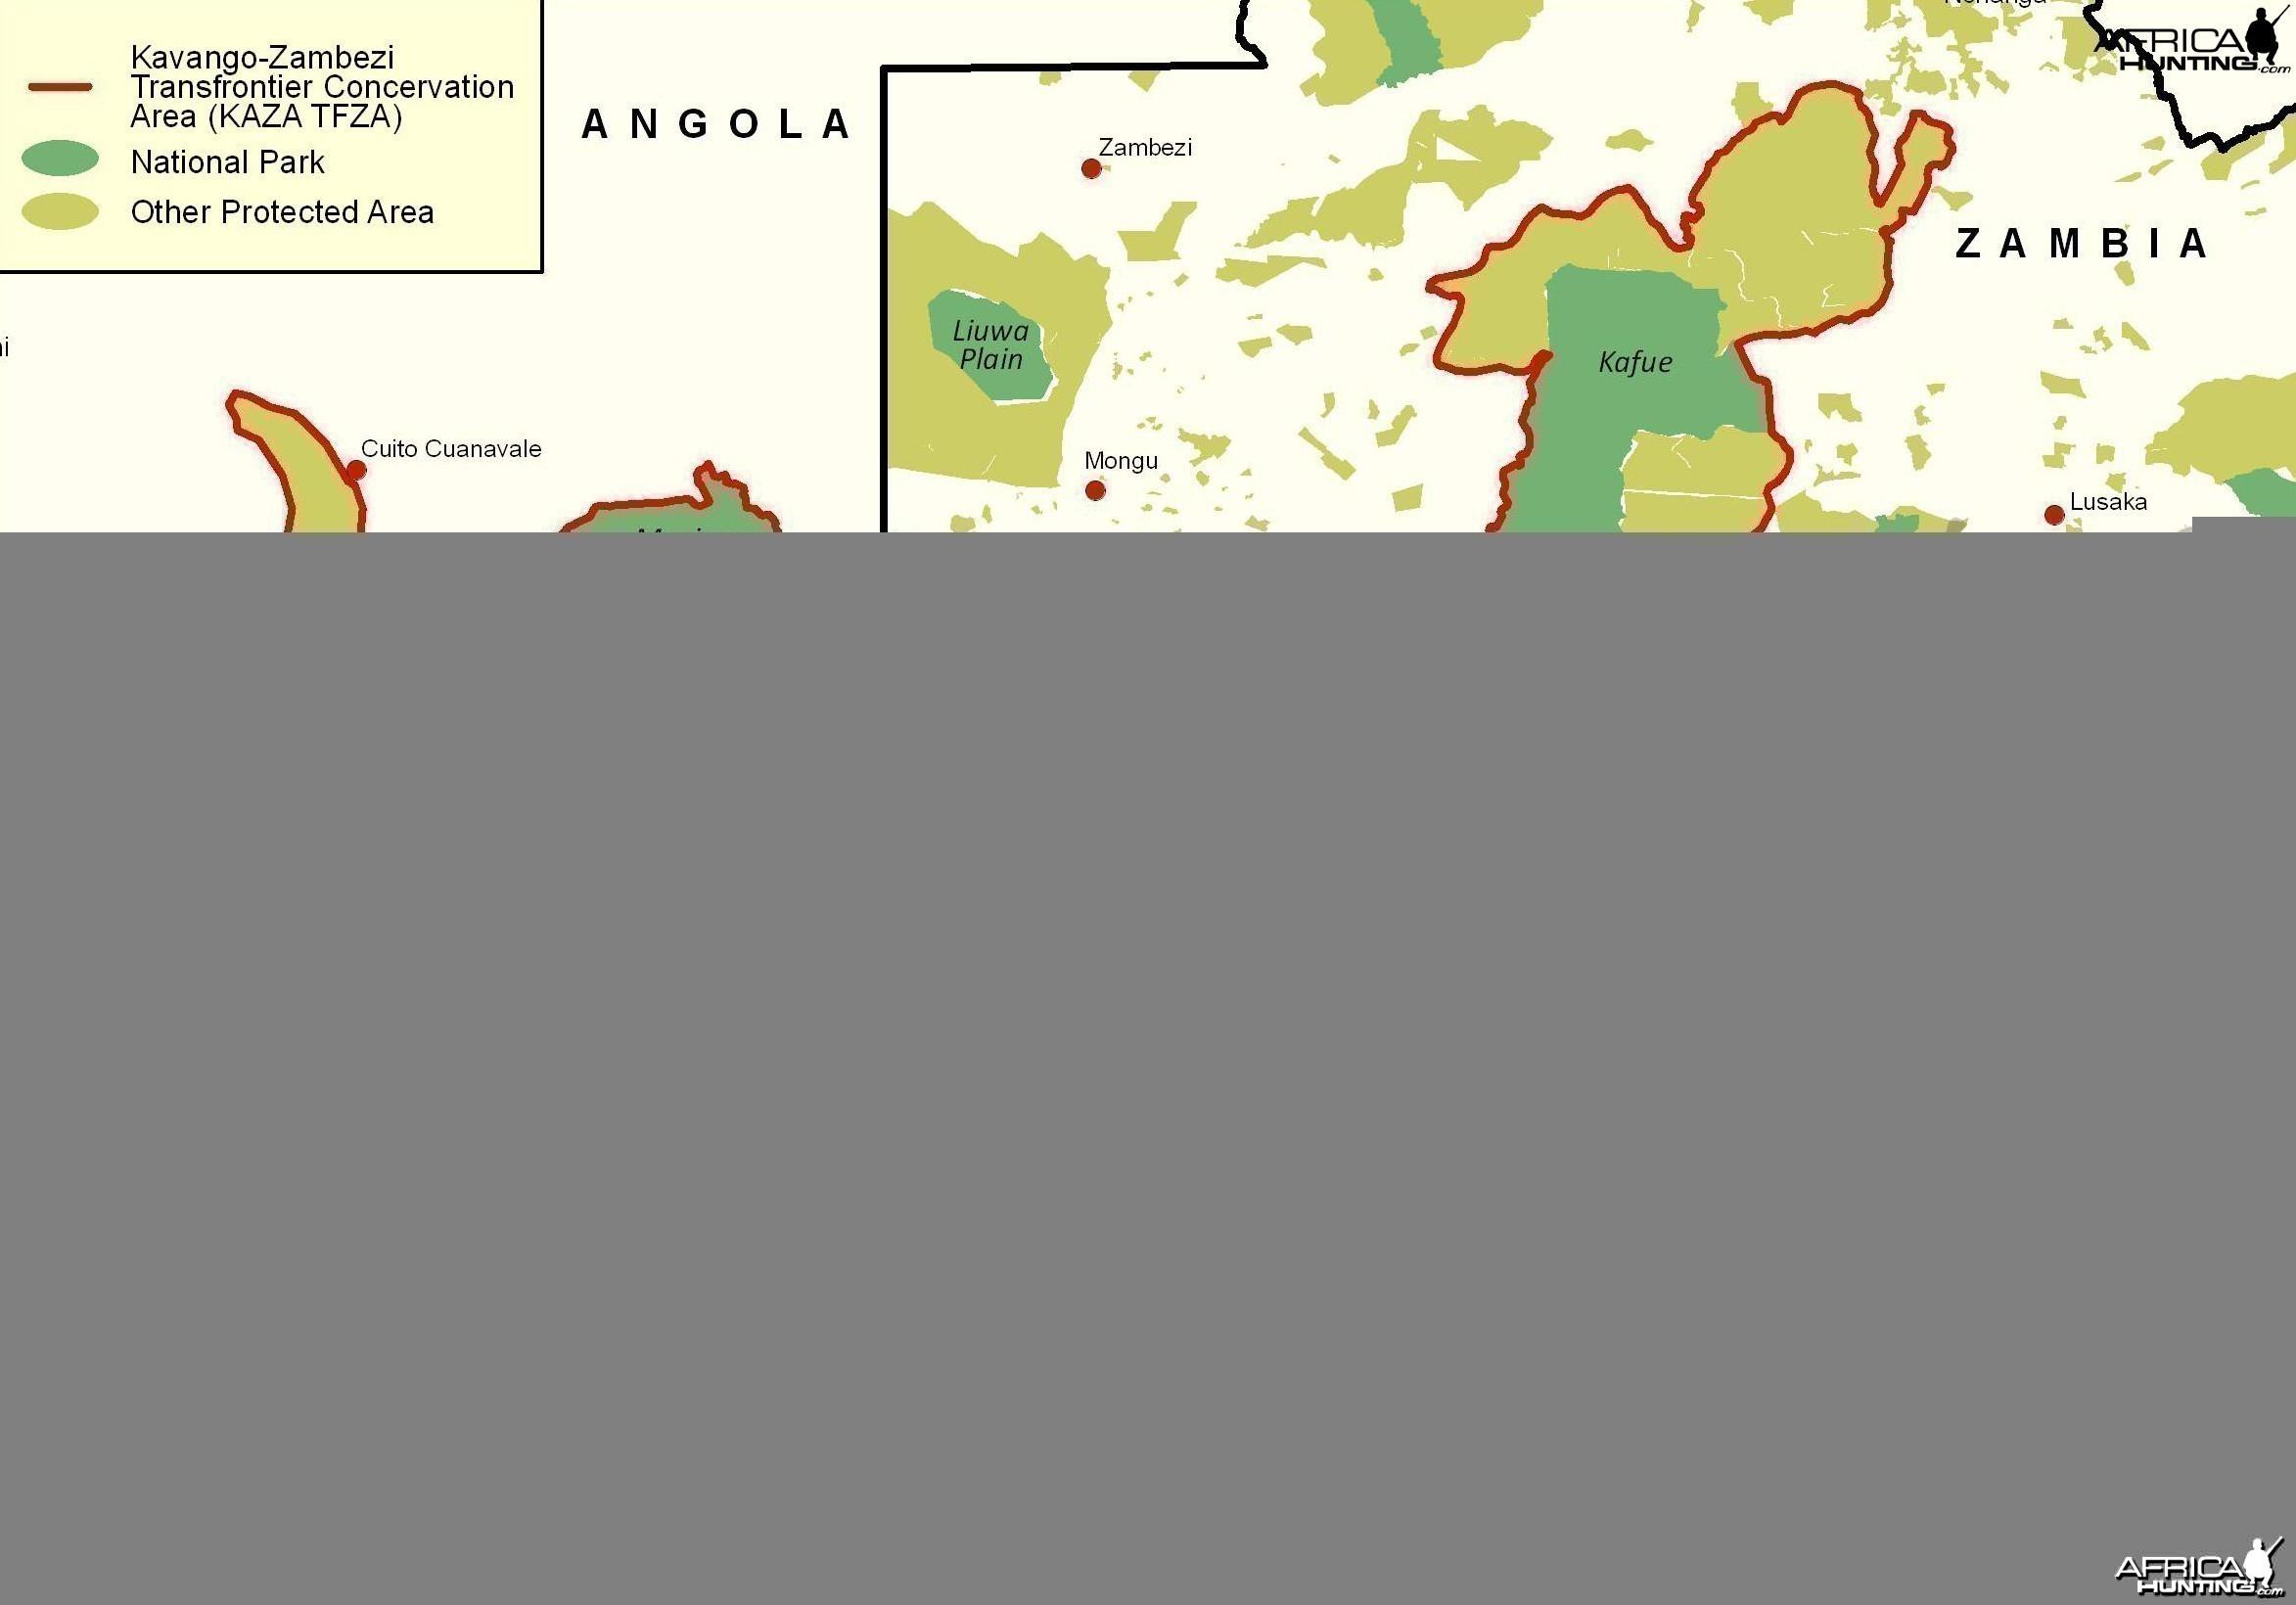 KAZA - Kavango Zambezi Transfrontier Area Map, Namibia